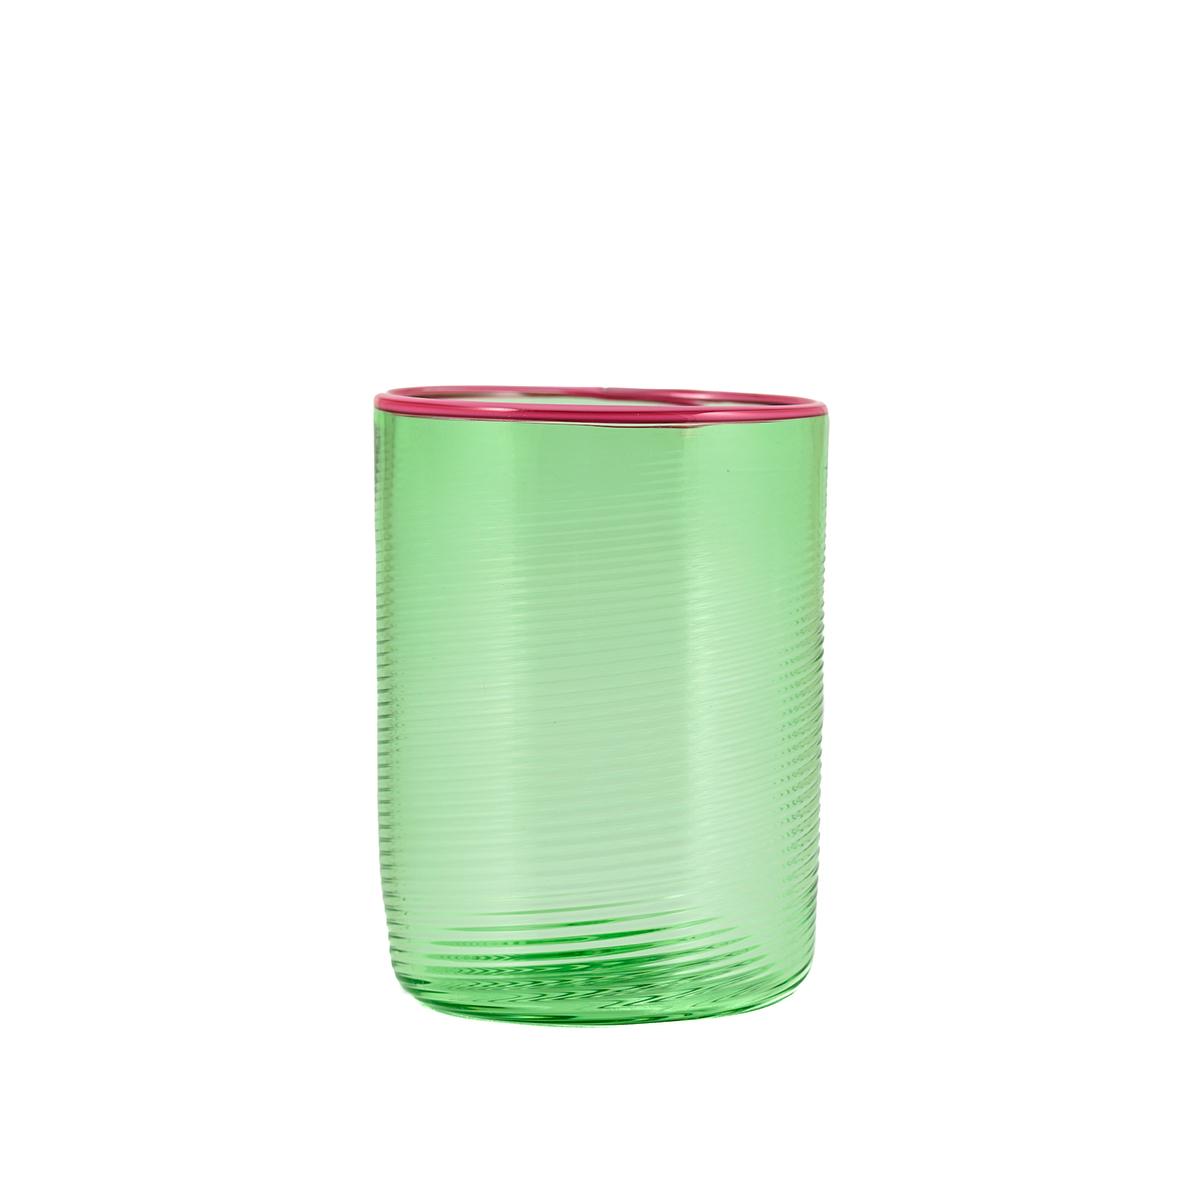 fizzy-verde-rosa-murano-venice-handblown-wine-handmade-pink-green